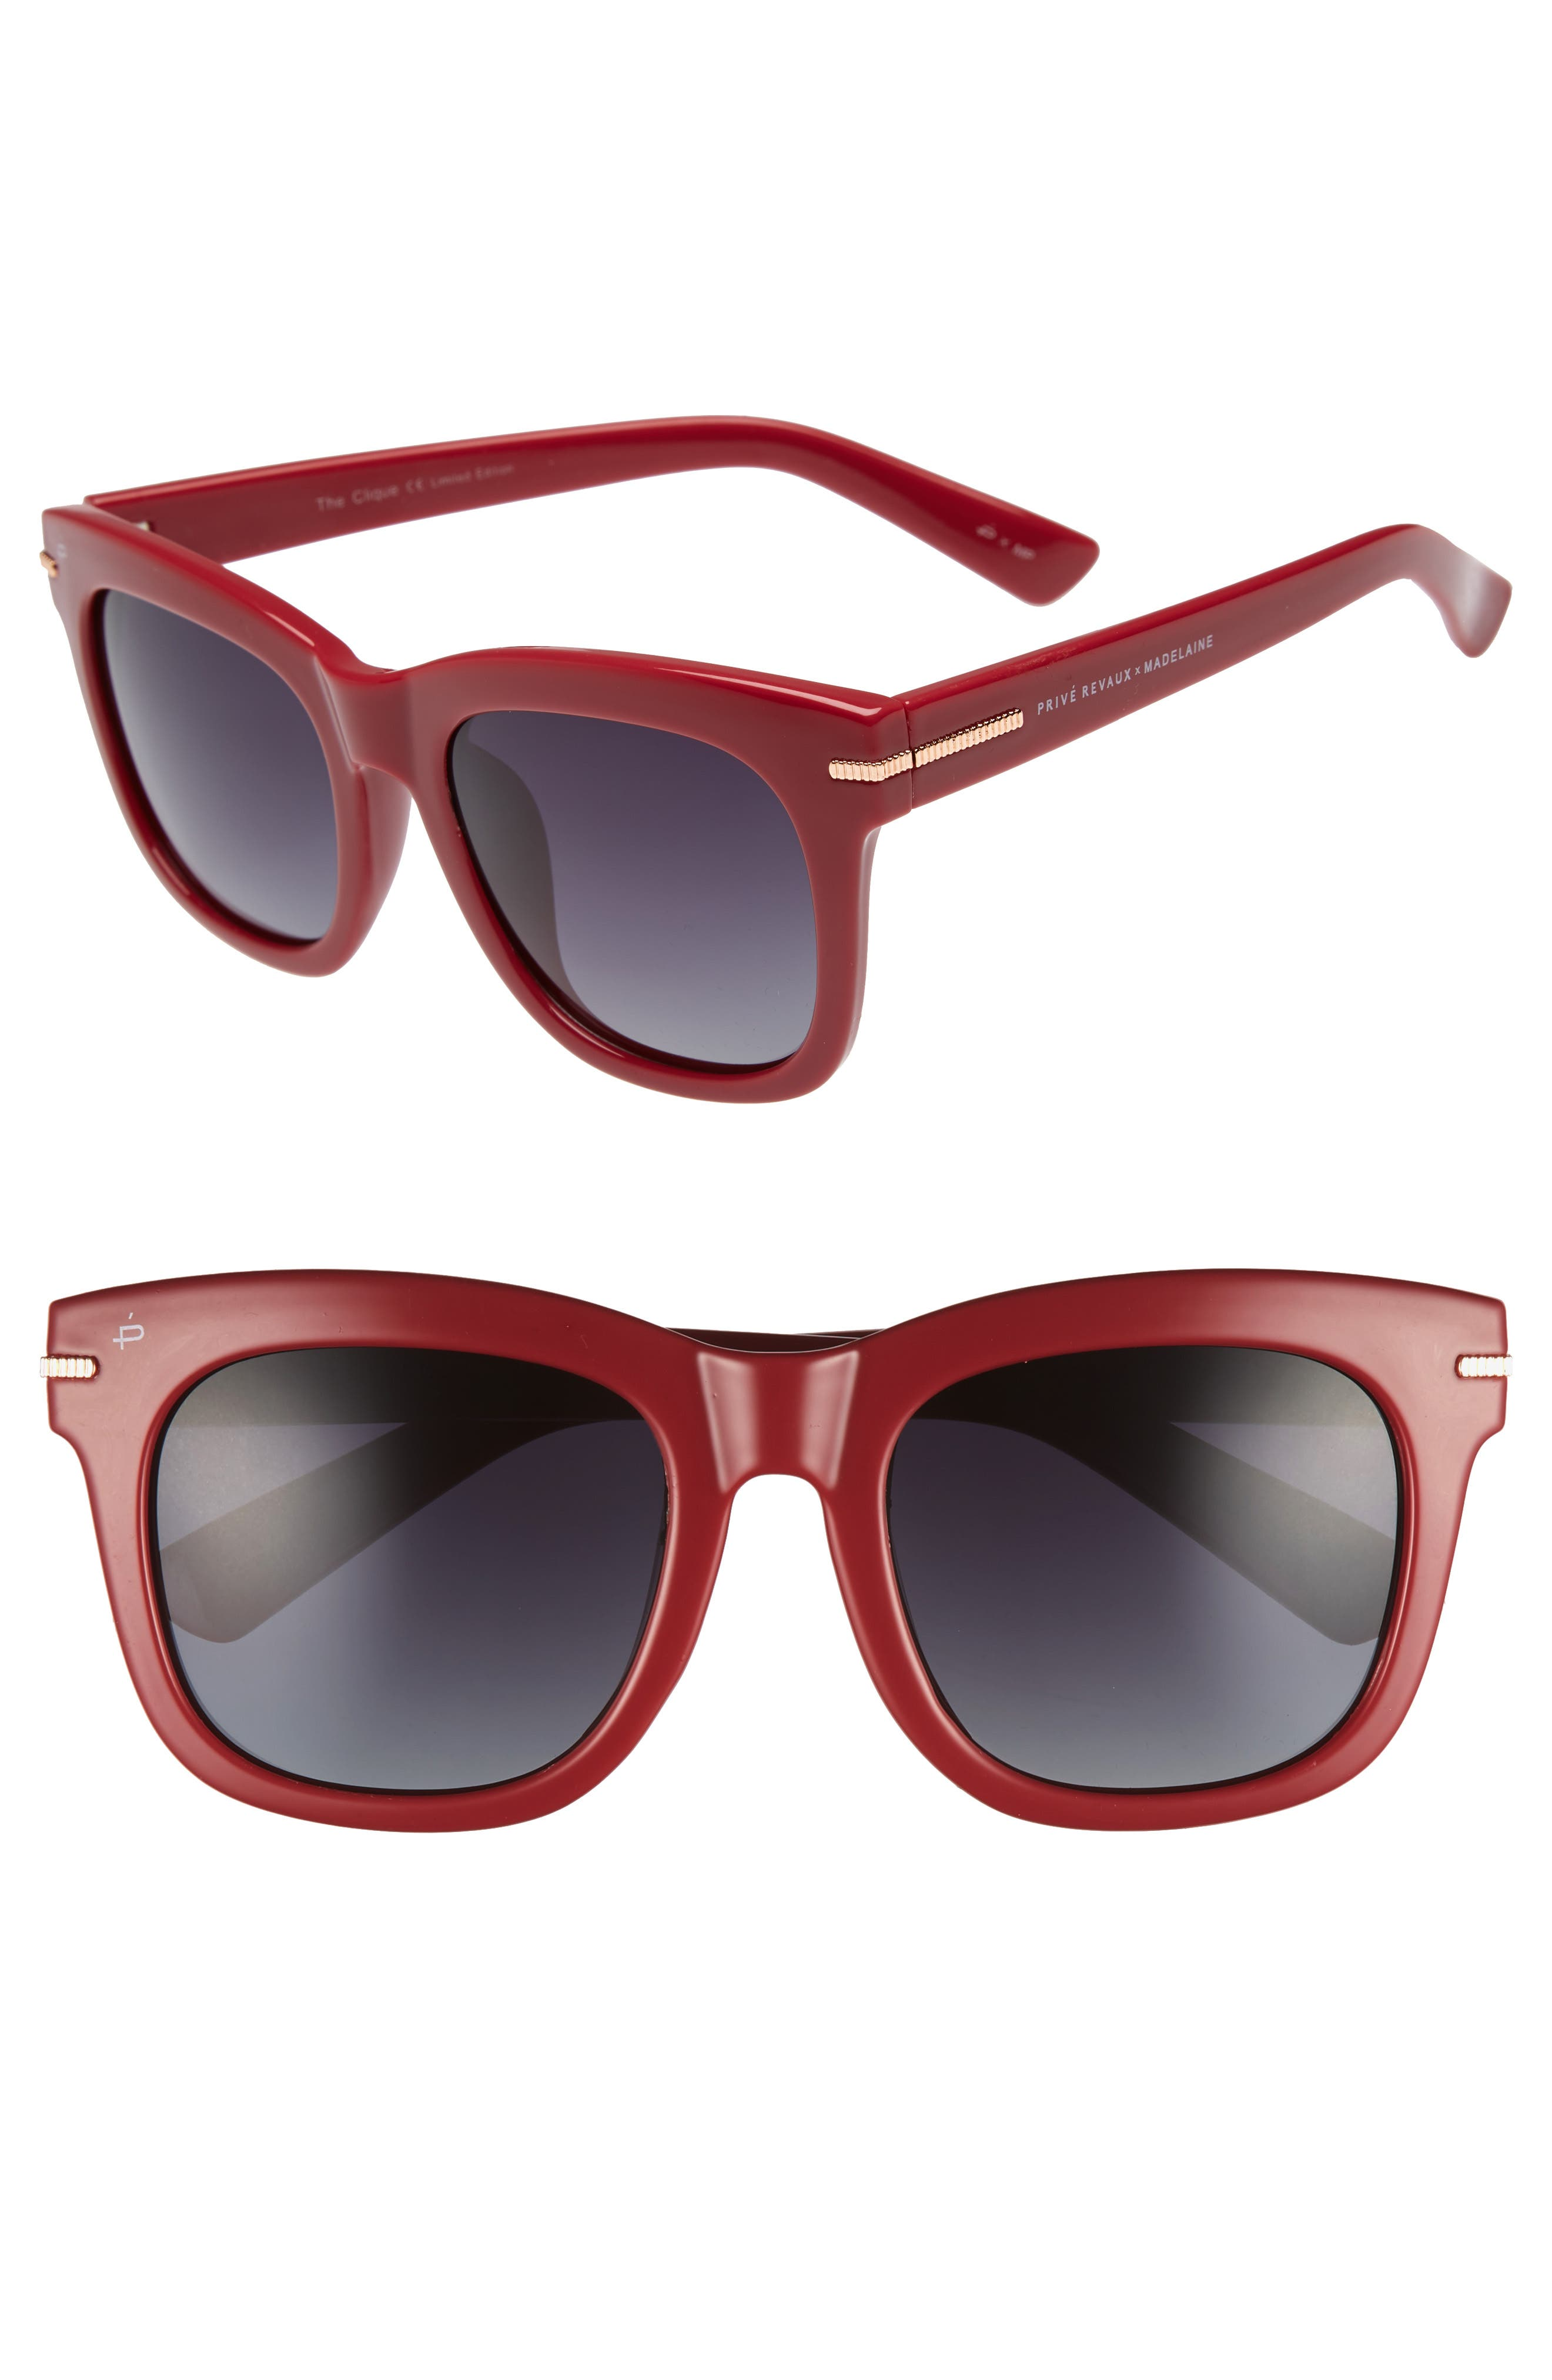 Privé Revaux x Madelaine Petsch The Clique 52mm Square Sunglasses